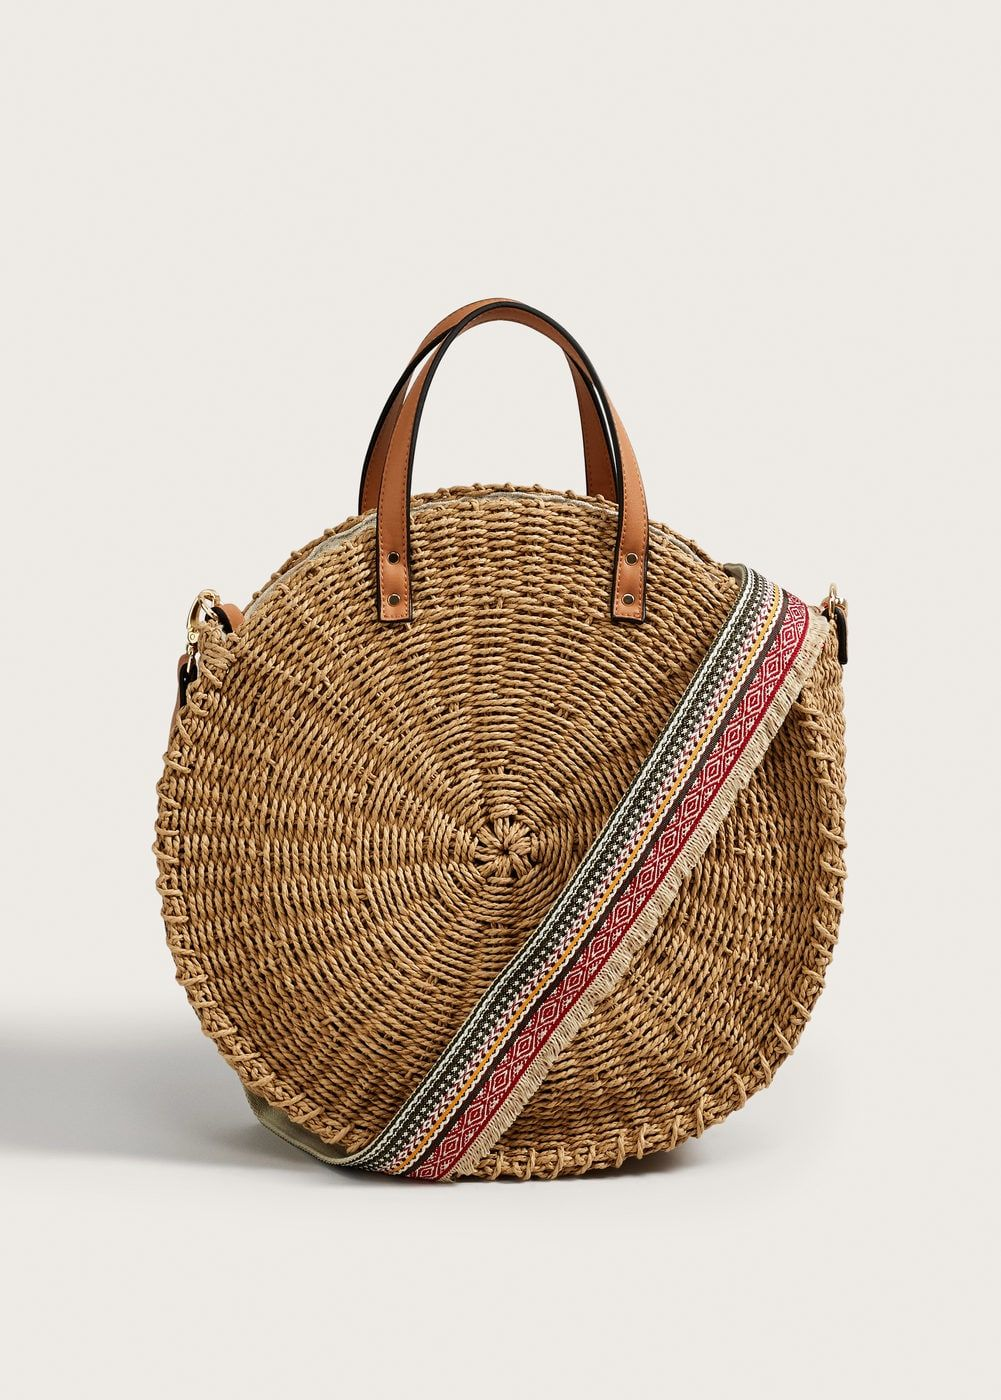 936675ffa21 Round raffia bag - Plus sizes in 2019 | Fashions | Bags, Cloth bags ...